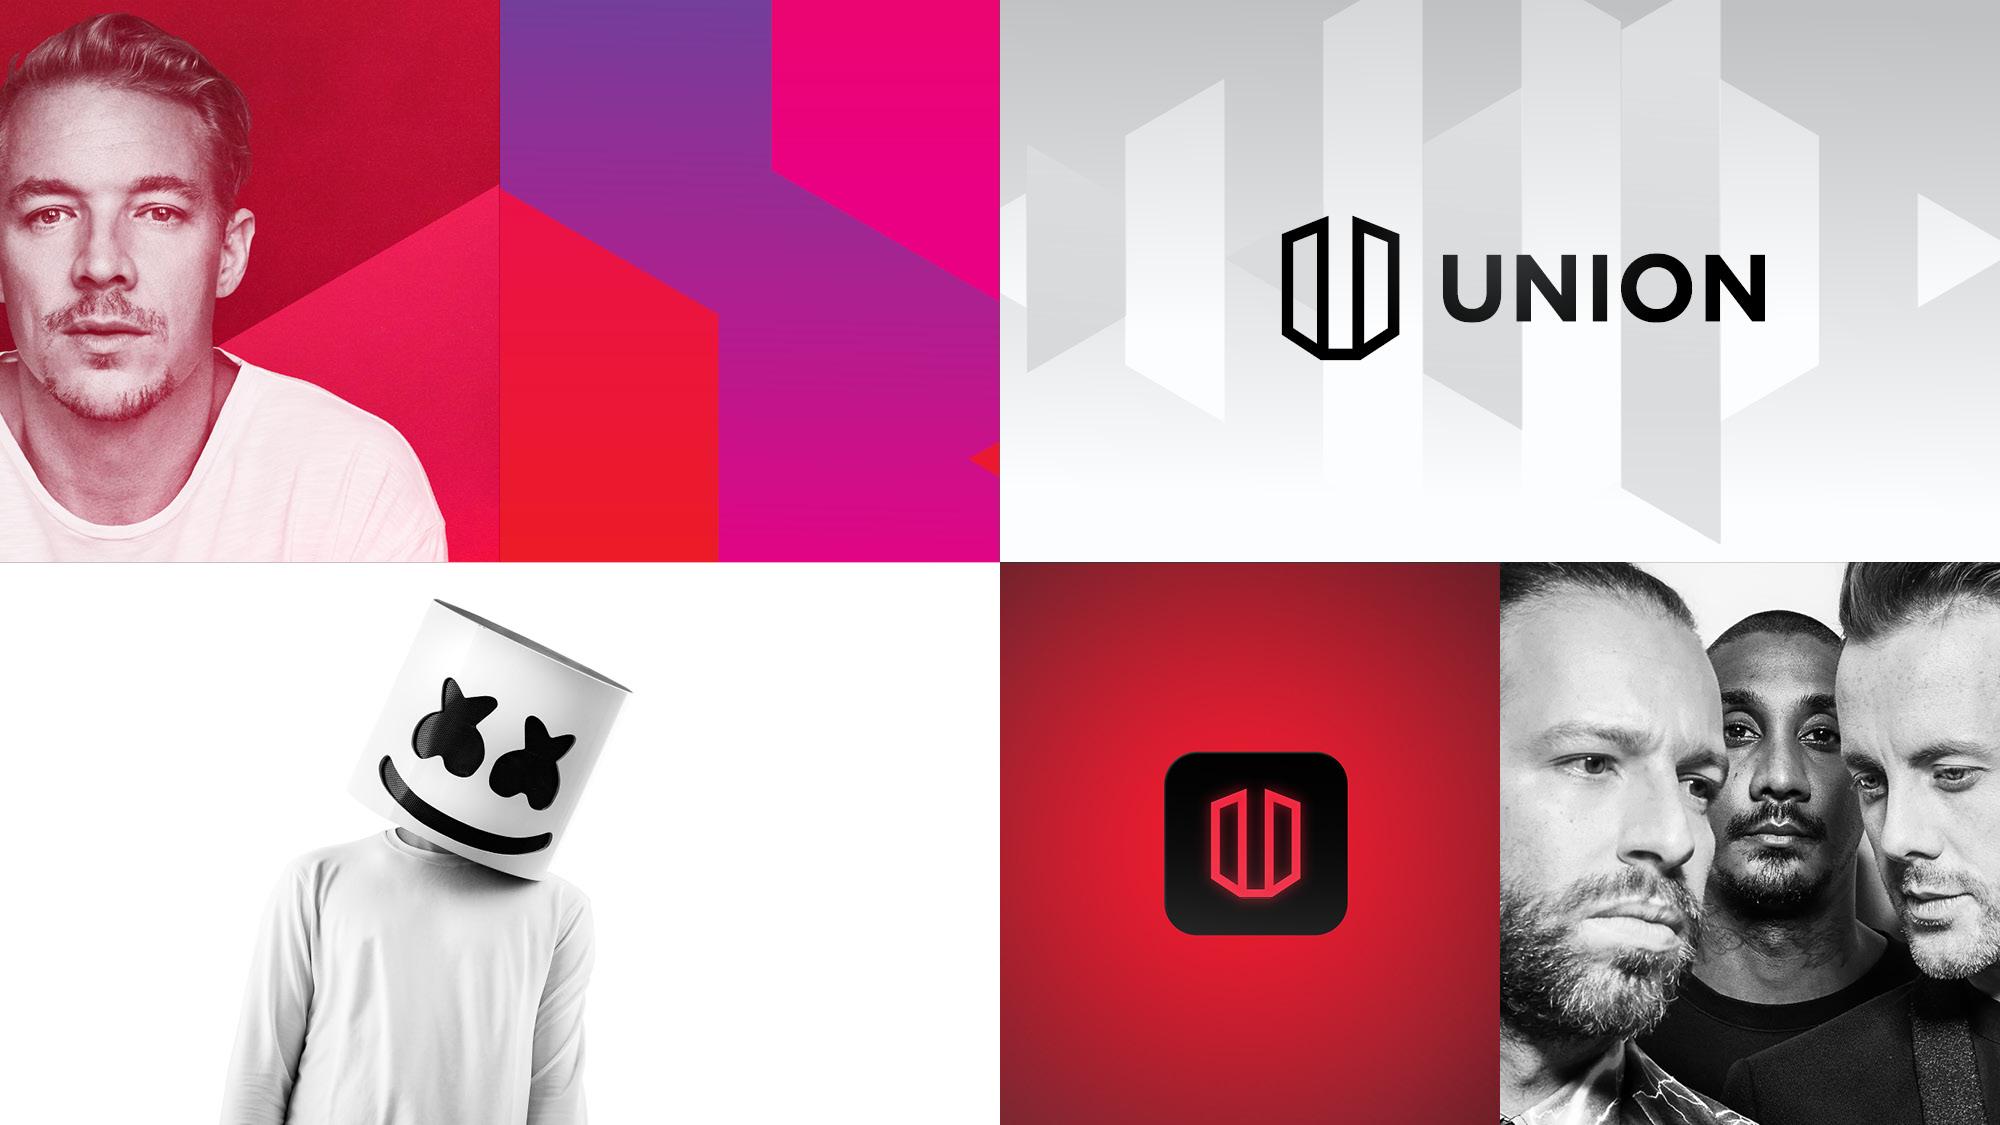 Nacione-Branding-Union-IV-Music3